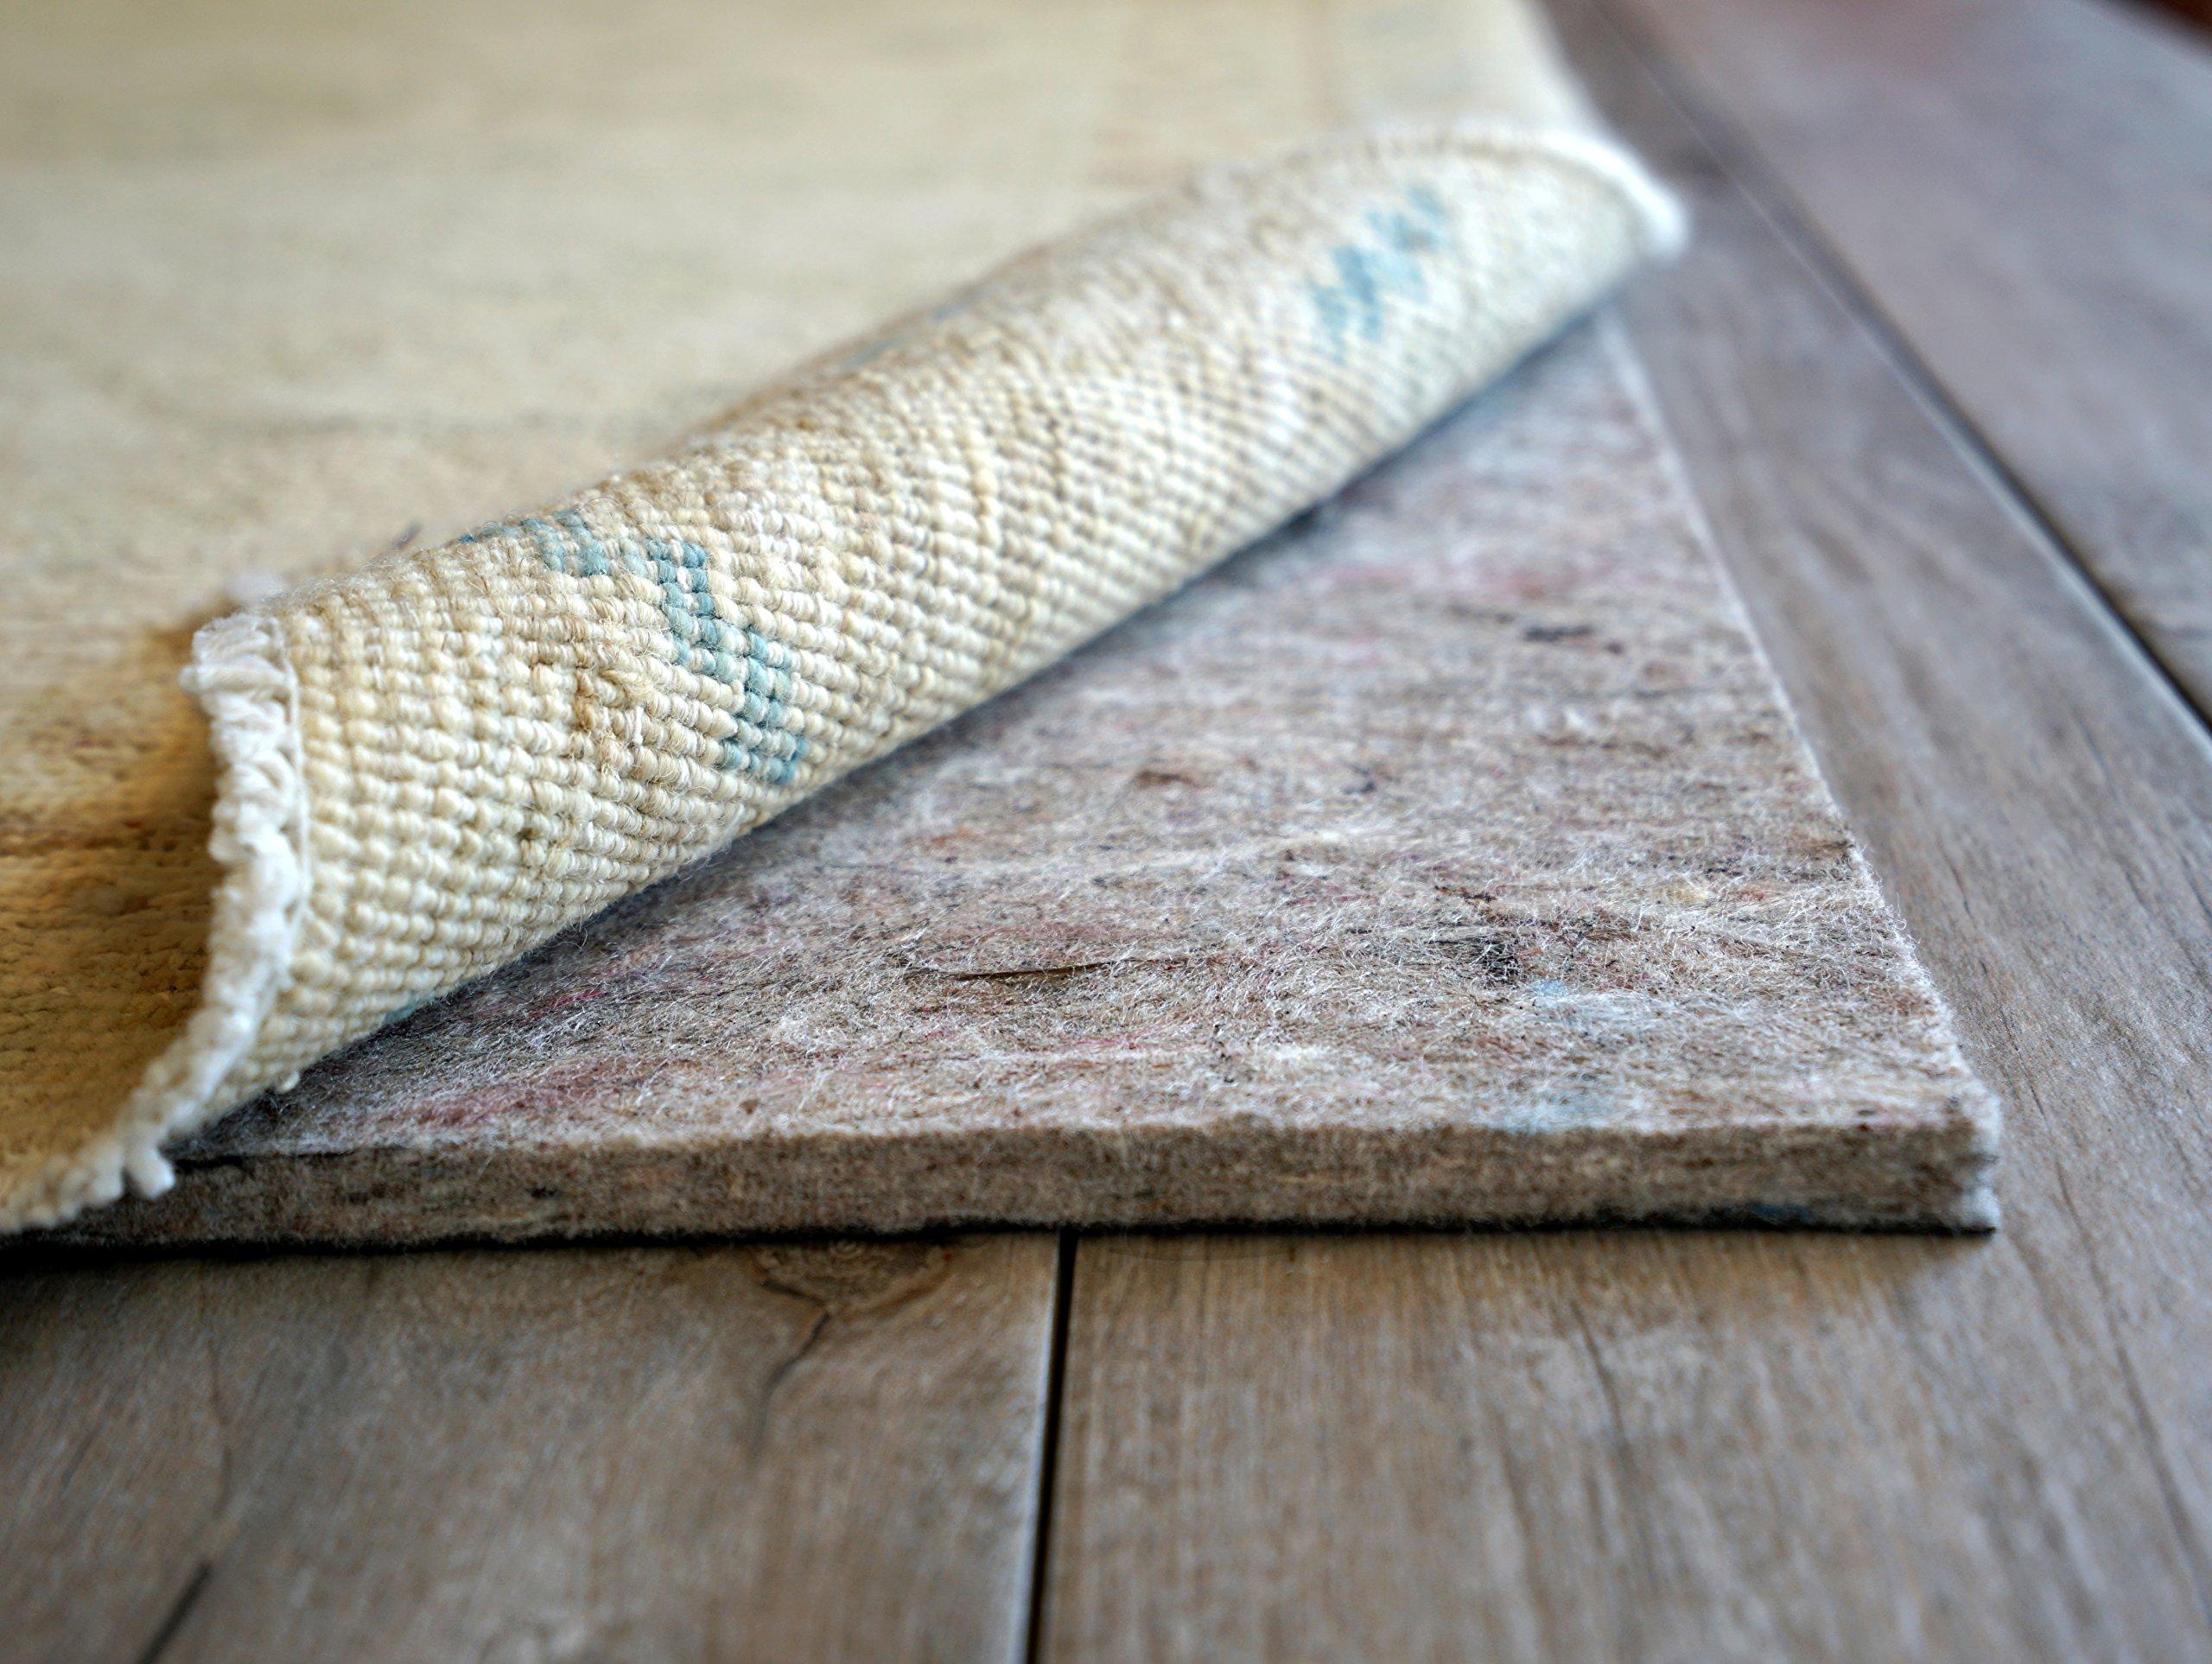 Rug Pad USA, 1/4'' Thick, Felt and Rubber, 9'x13', Superior Lock- Premium Non Slip Rug Padding for Hardwood Floors by Rug Pad USA (Image #2)